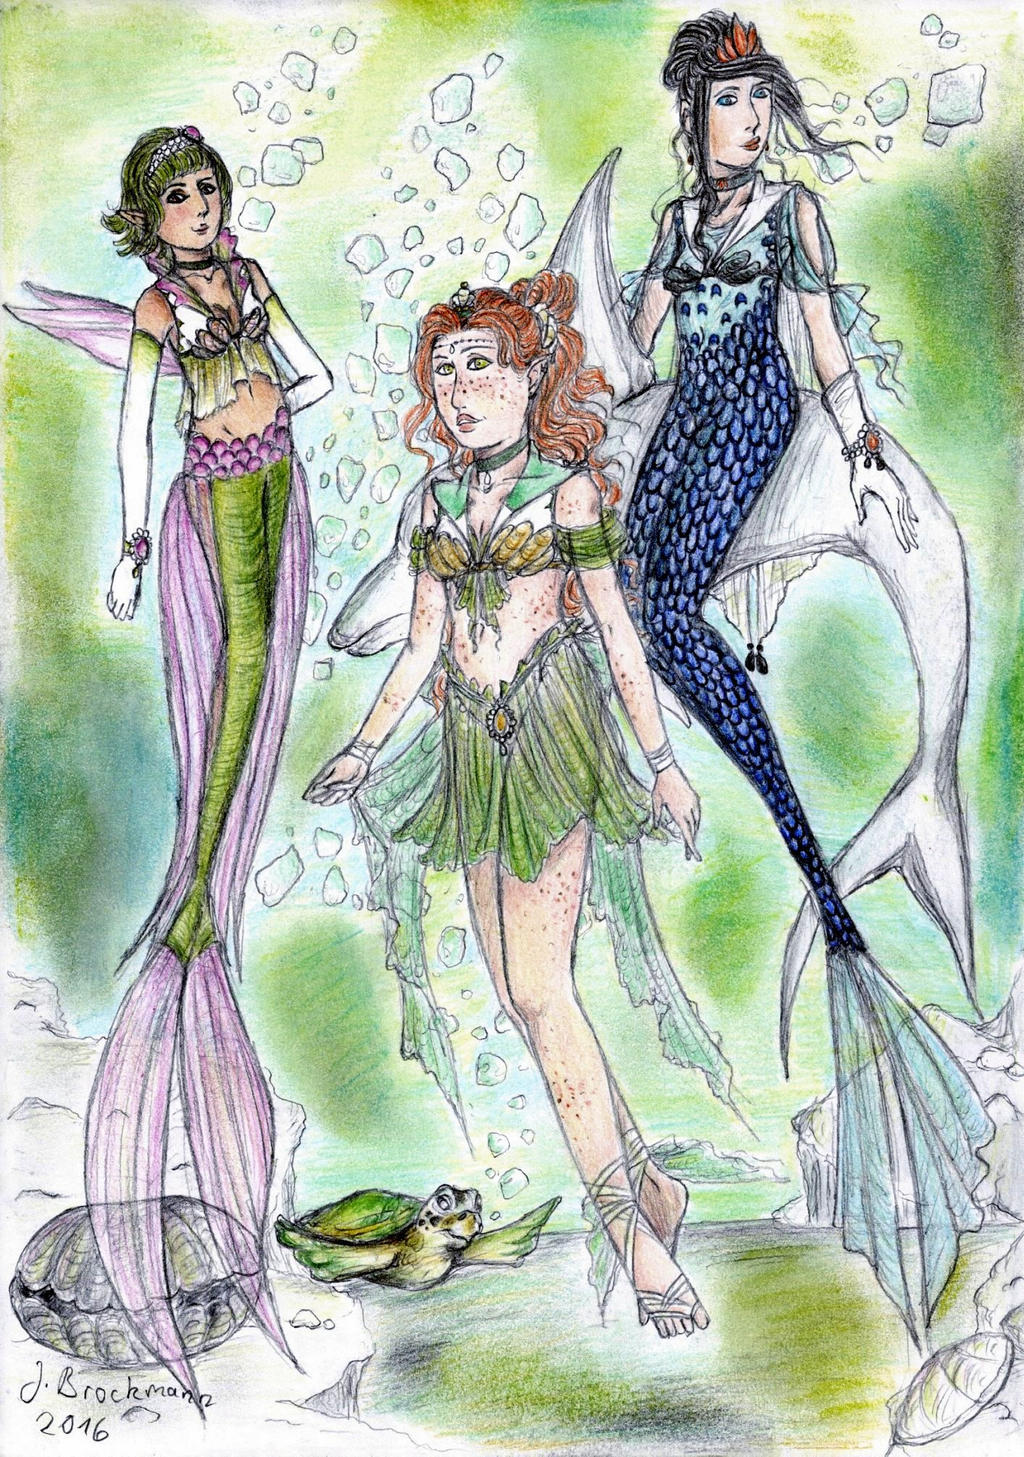 Sailor Cerrybelle, Mizubelle und Neobelle (colo) by sunnight1